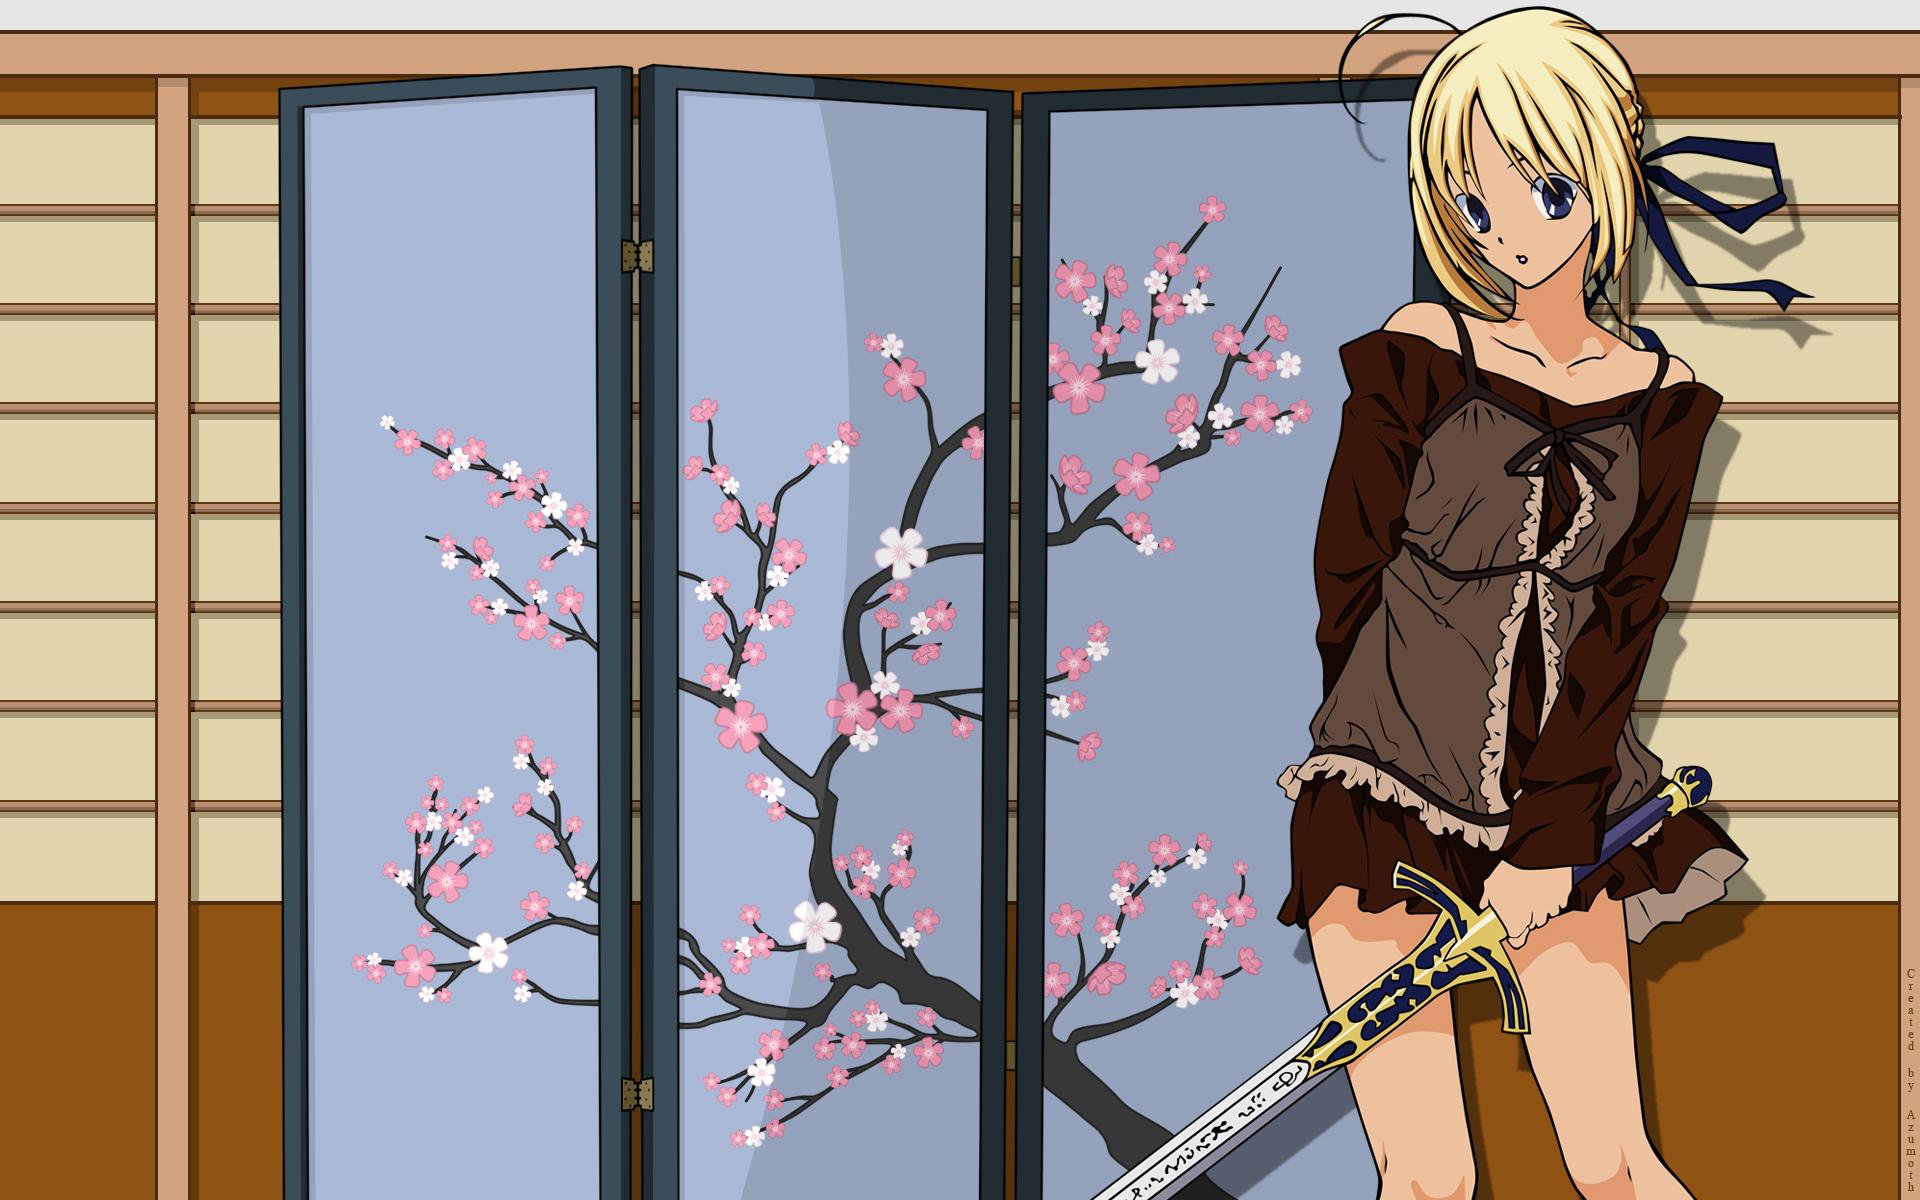 artoria_pendragon_(all) fate/hollow_ataraxia fate_(series) fate/stay_night saber type-moon